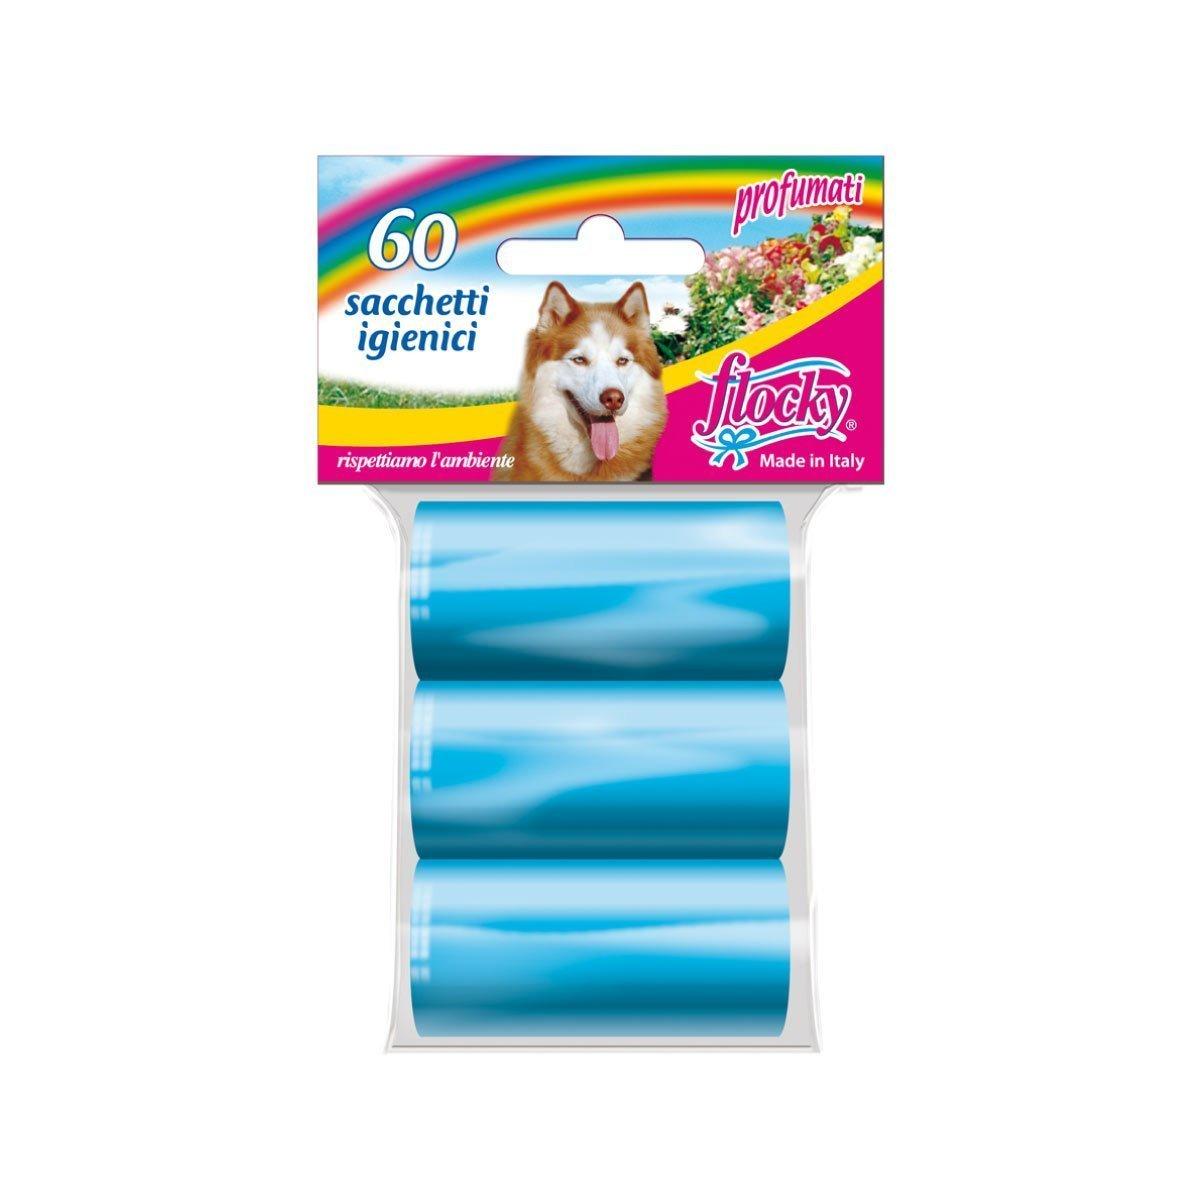 Flocky | Sacchetti igienici per cani | Linea Color | art.016a